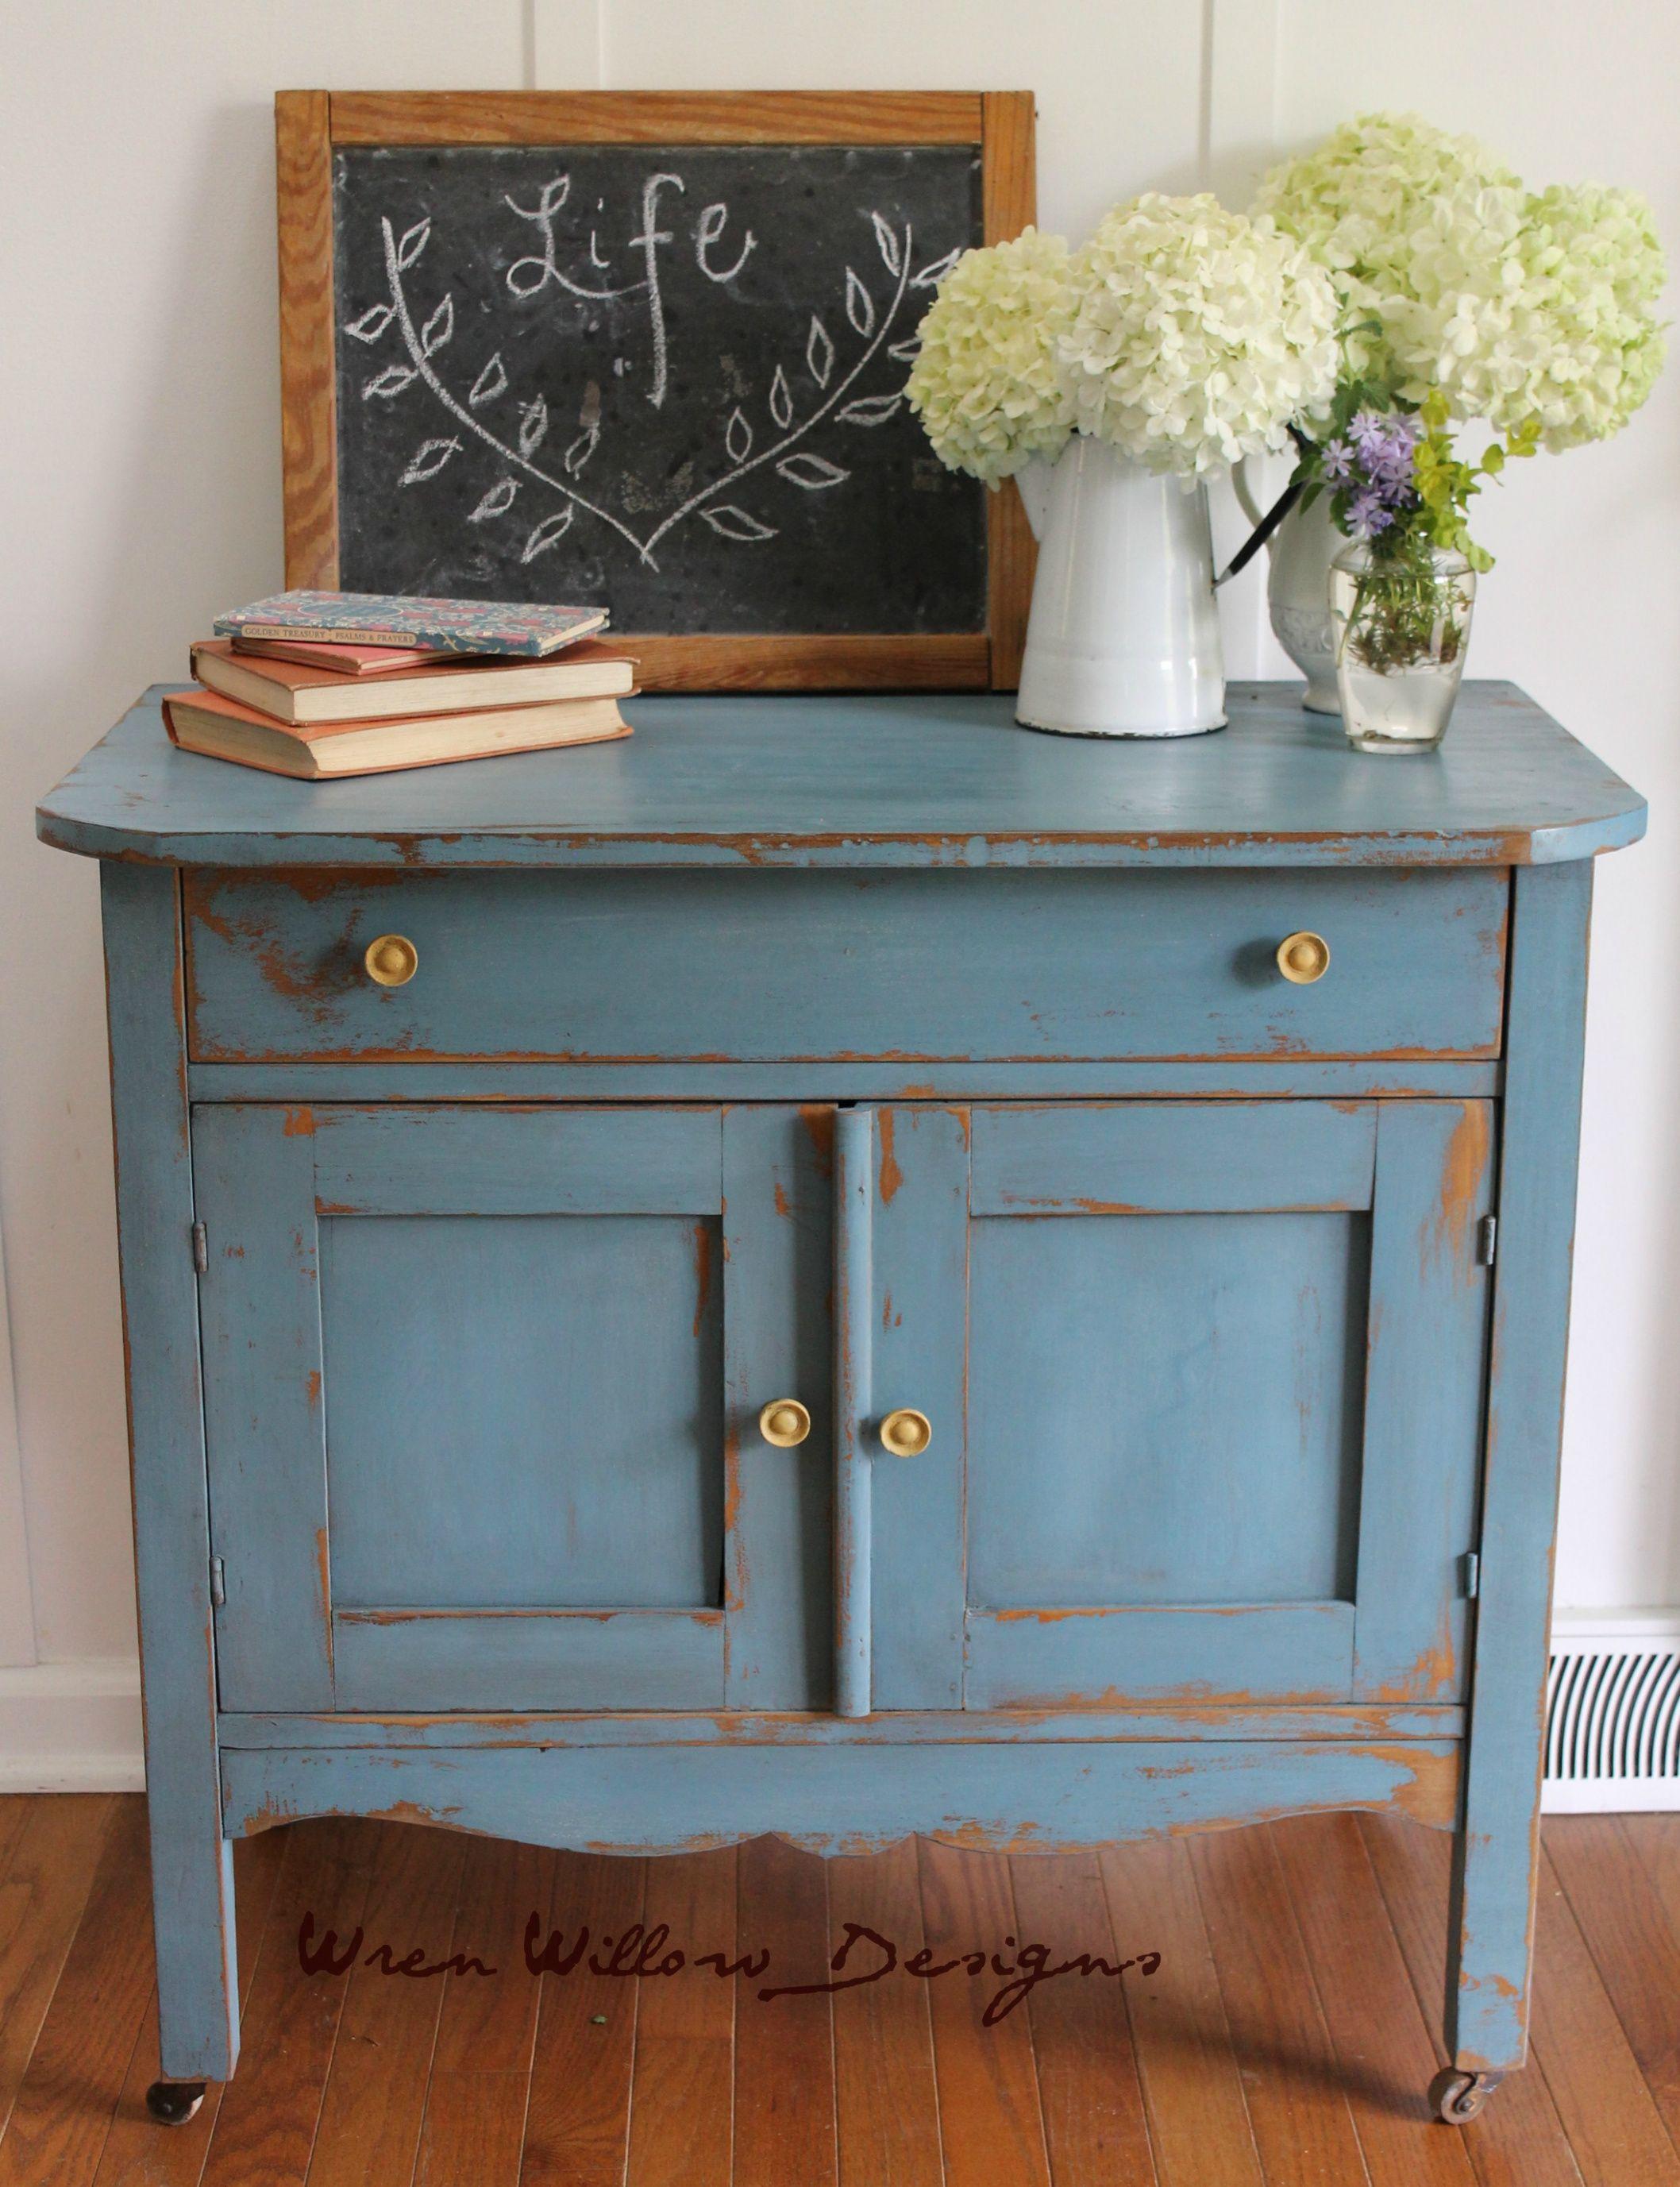 Acrylic Furniture Paint Best Bedroom Furniture Check More At Http Cacophonouscreations Com Acrylic Furniture Paint Goruntuler Ile Mobilya Dekorasyon